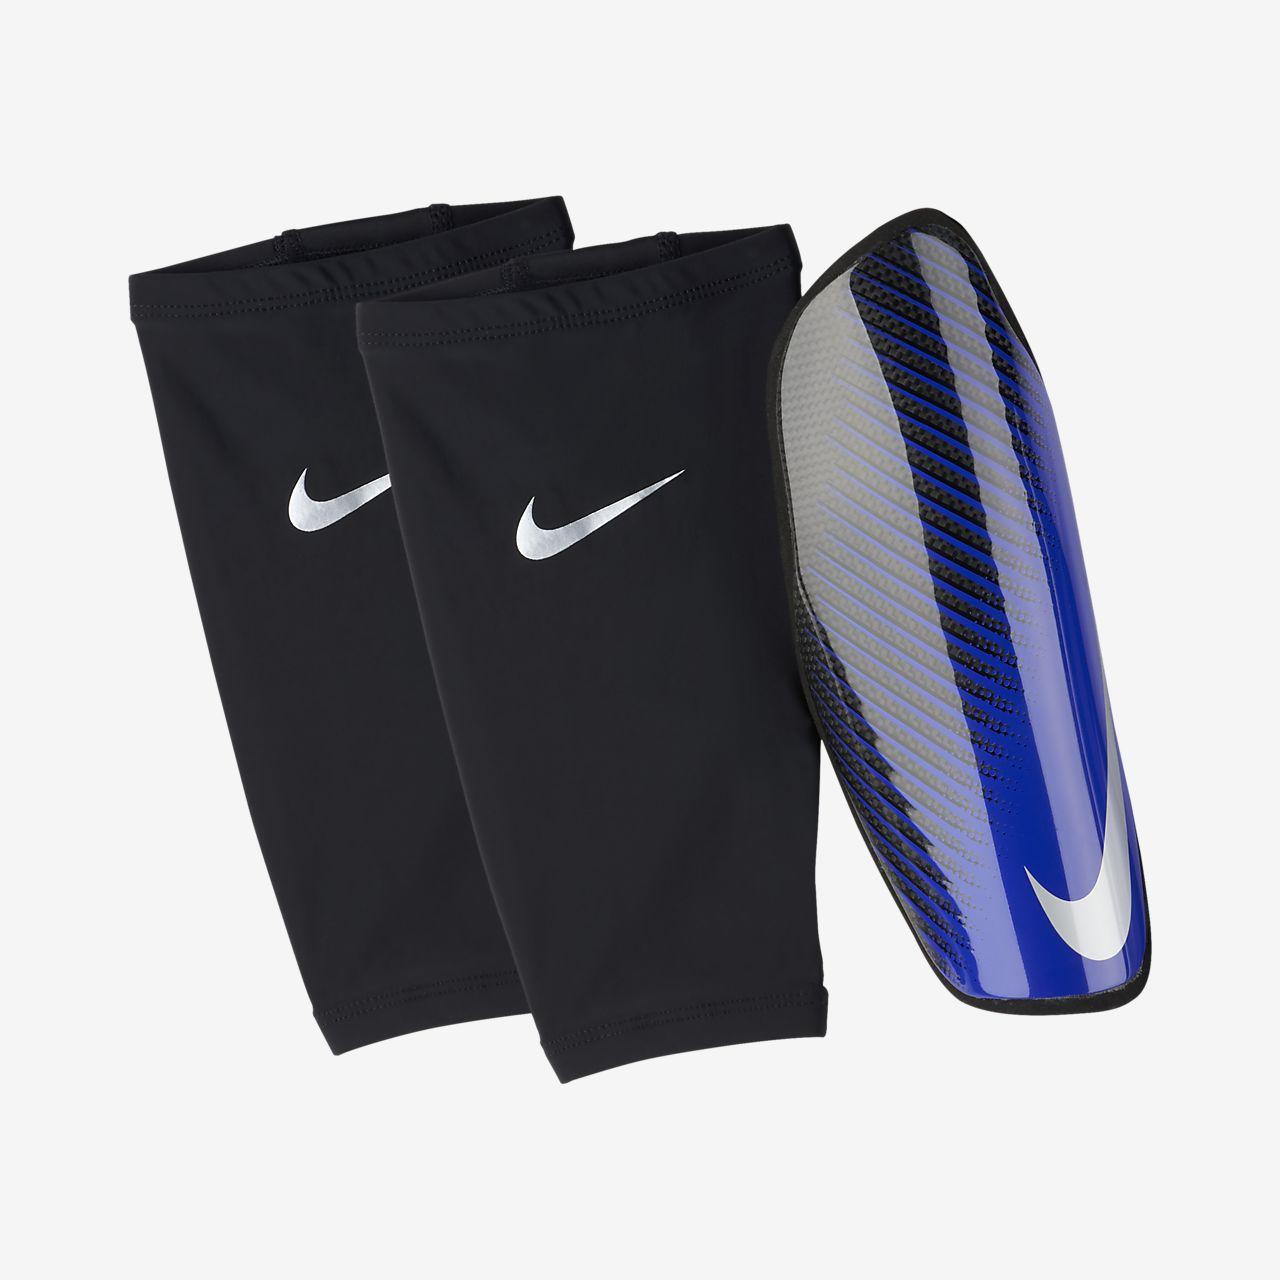 Nike Protegga Carbonite Football Shinguards